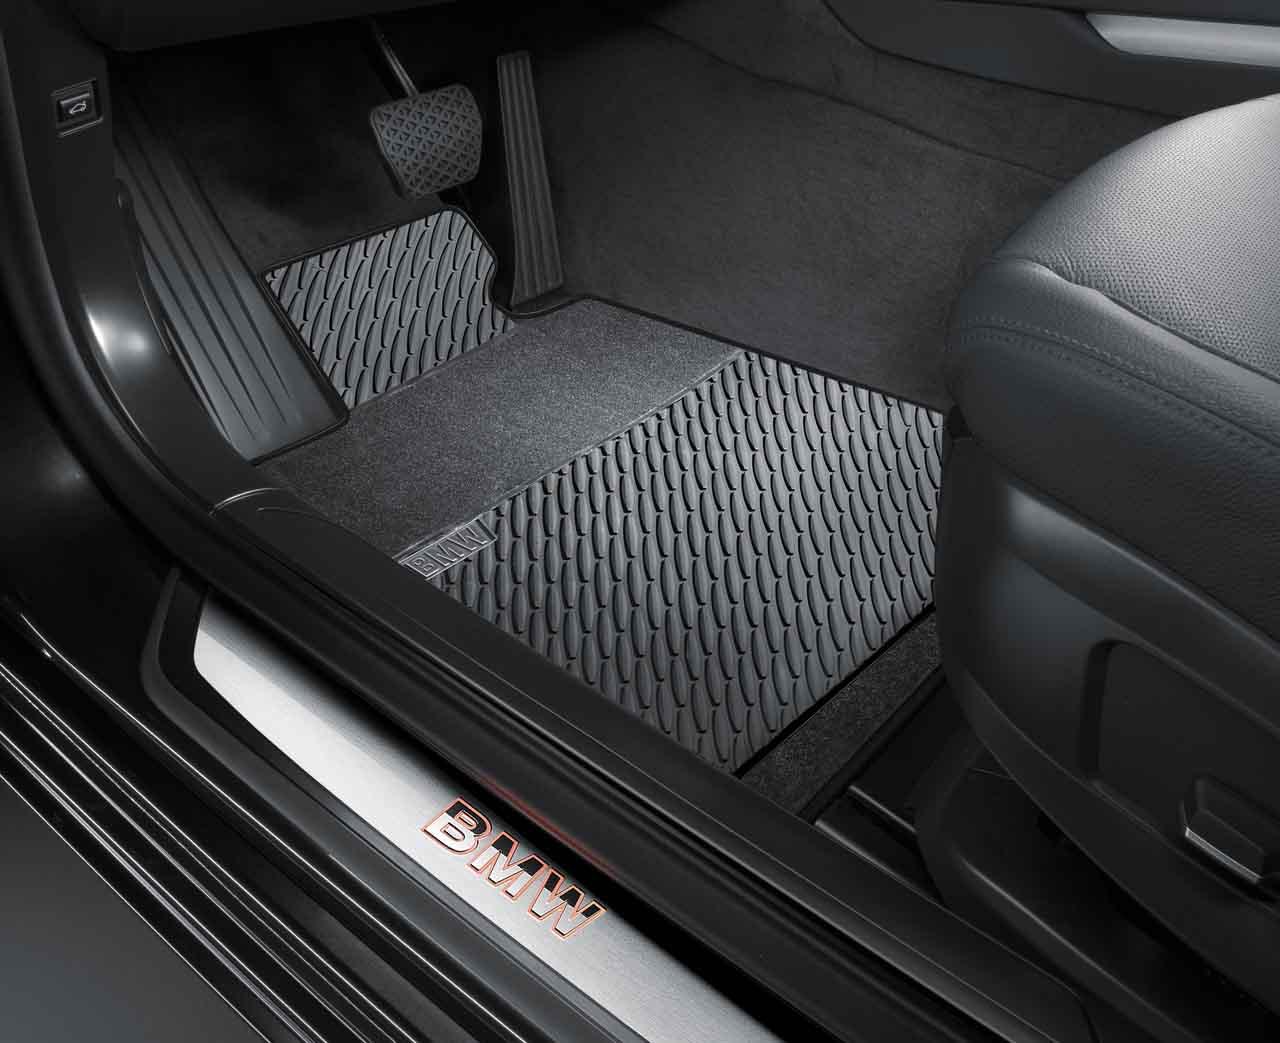 Bmw floor mats x1 - Bmw Genuine All Weather Rubber Front Floor Mats Set Black F01 F02 51472217582